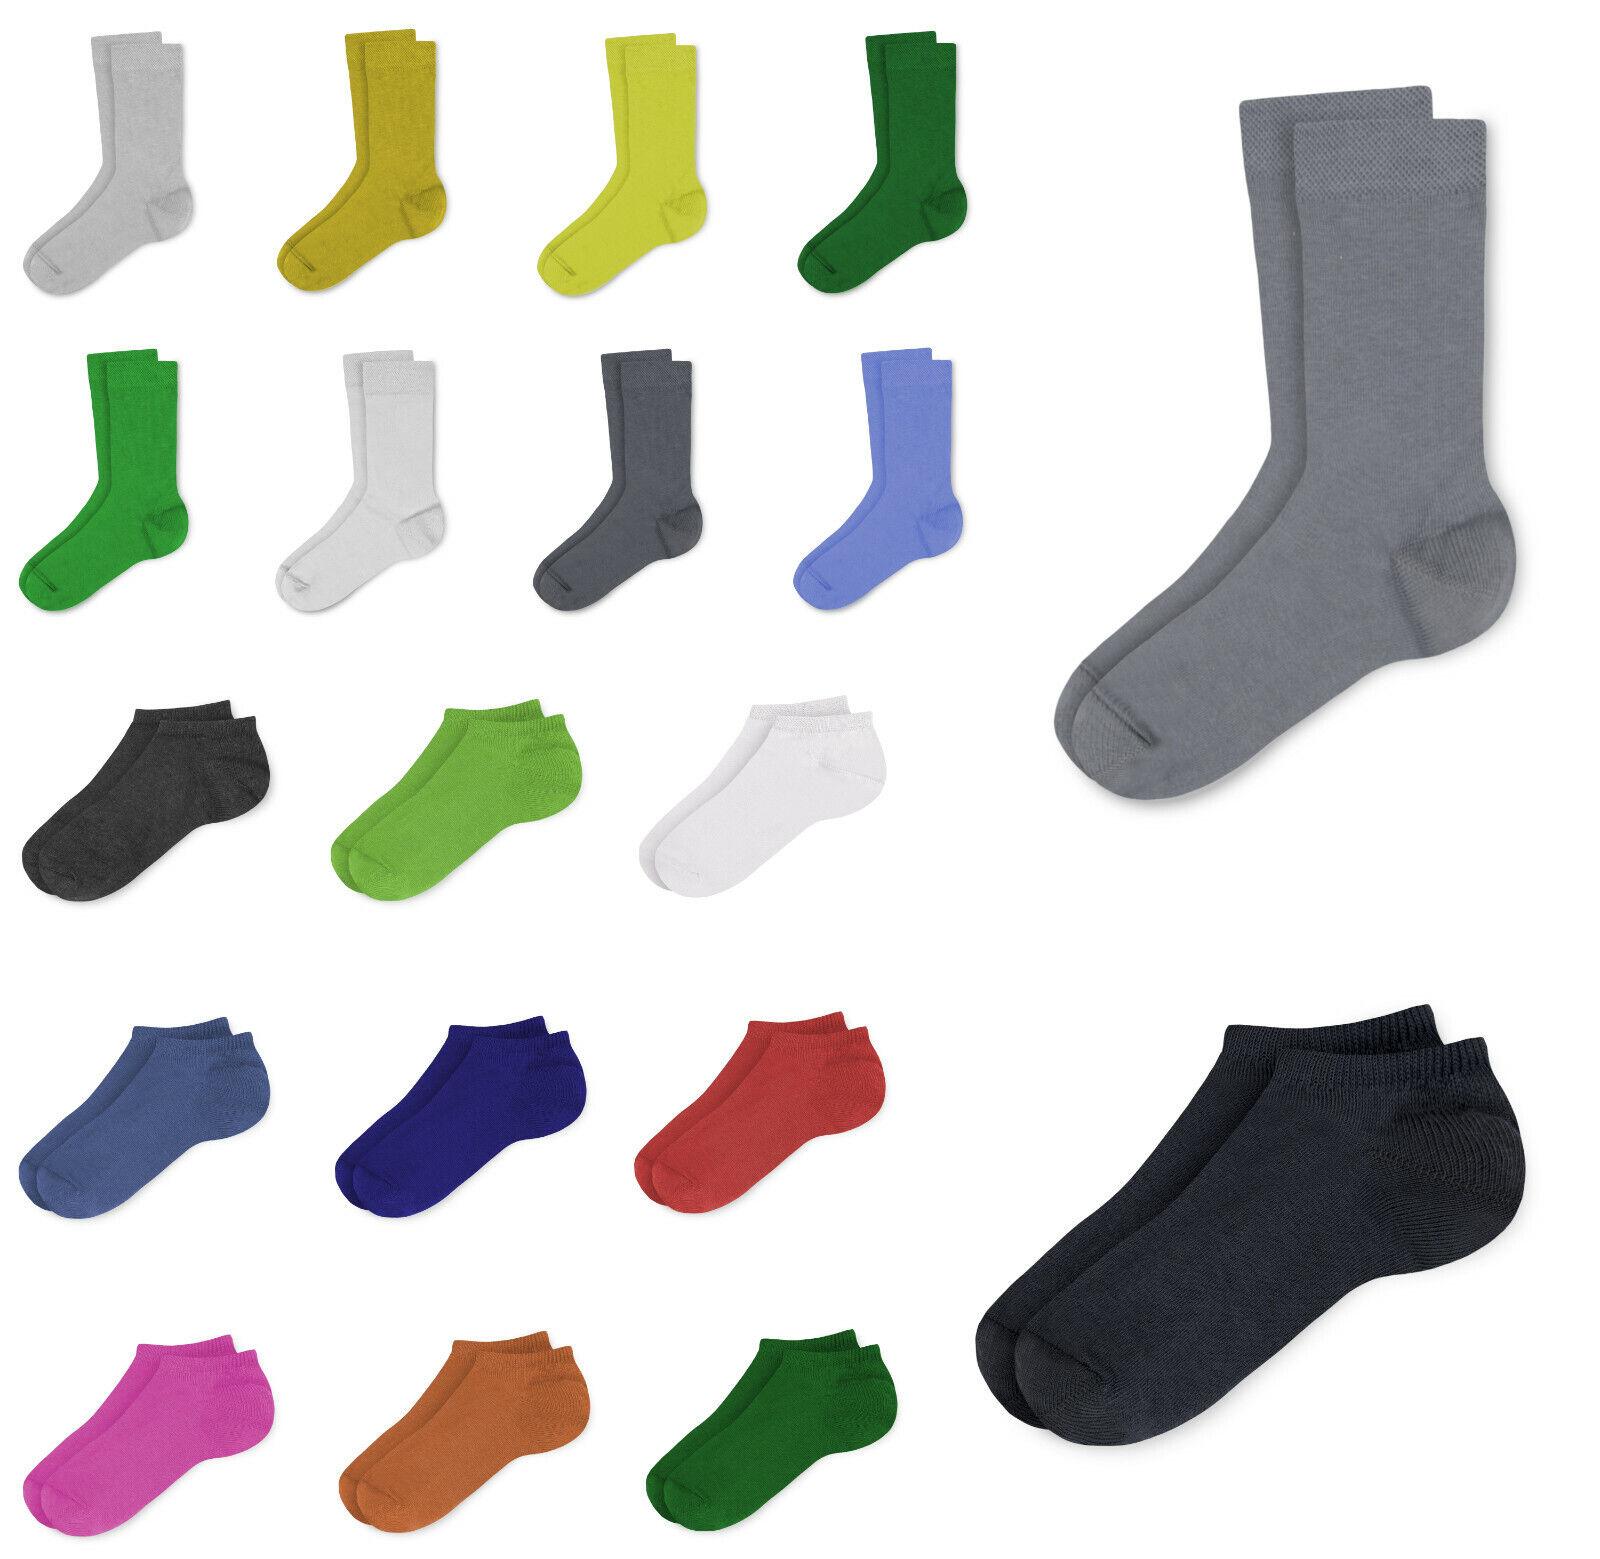 Damen Herren Sneaker Socken Sport Freizeit Socken Baumwolle Komfort BUSINESS